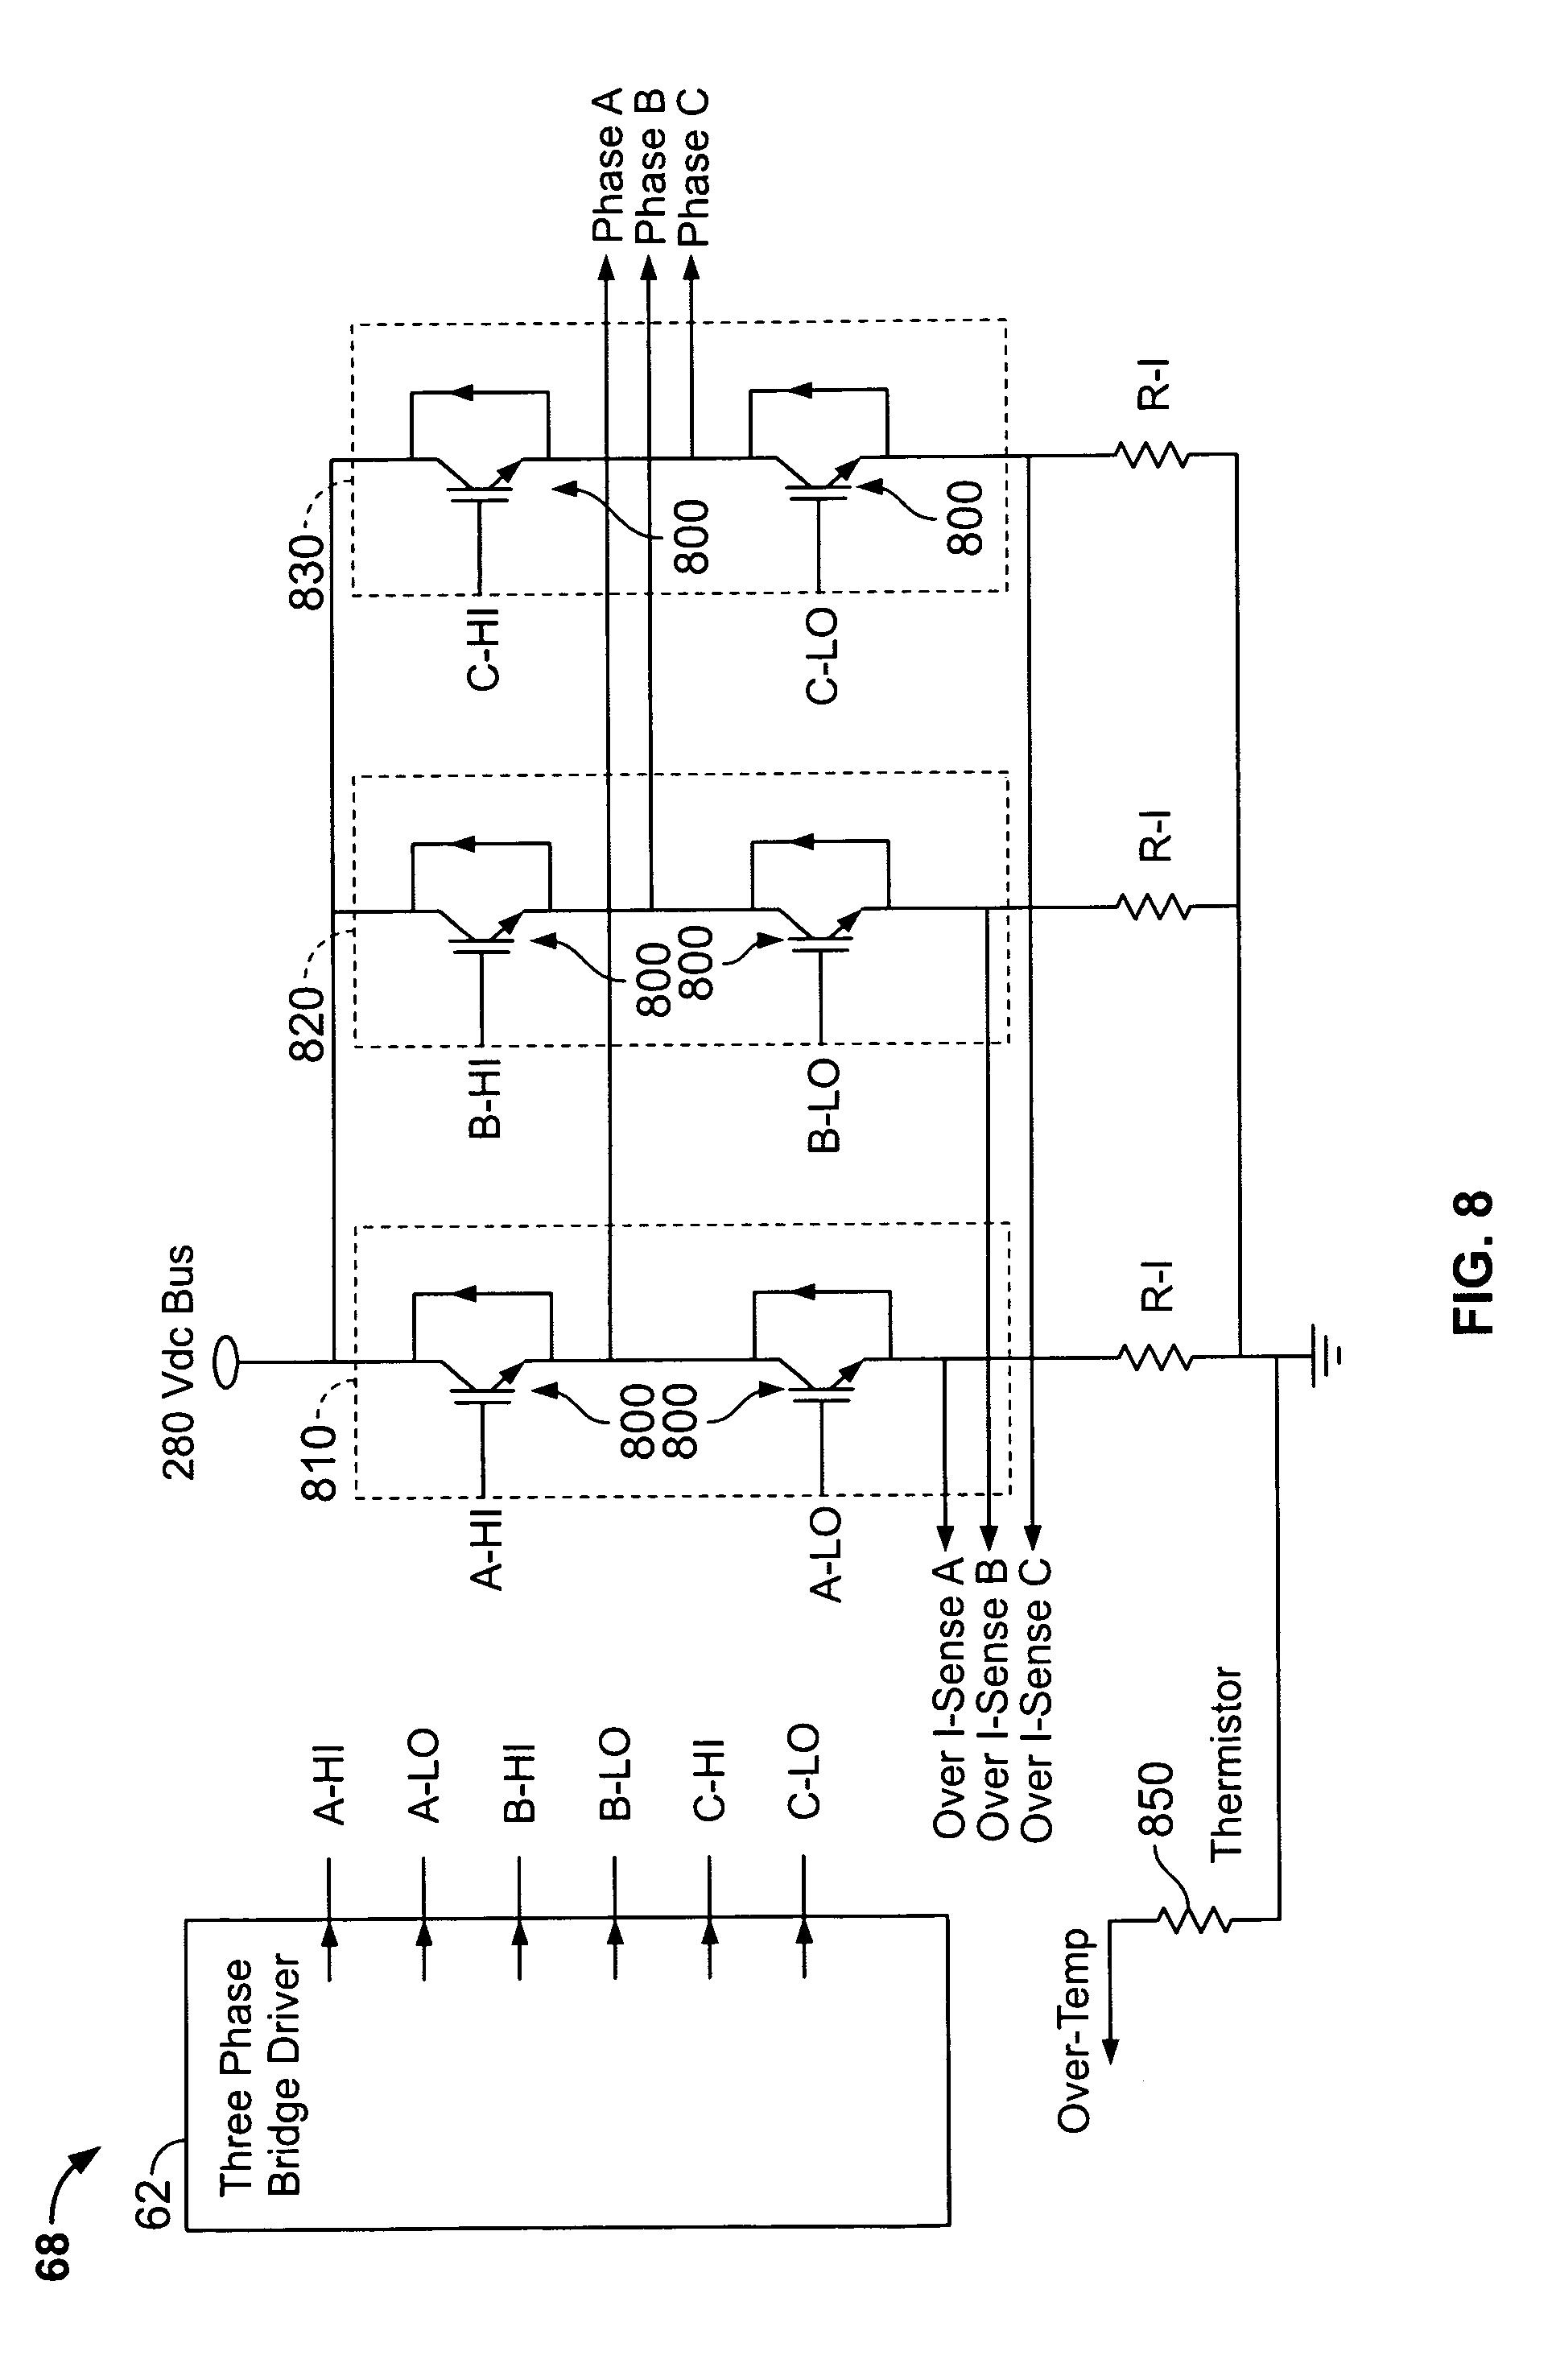 Wiring Diagram For Interposing Relay Powerking Co